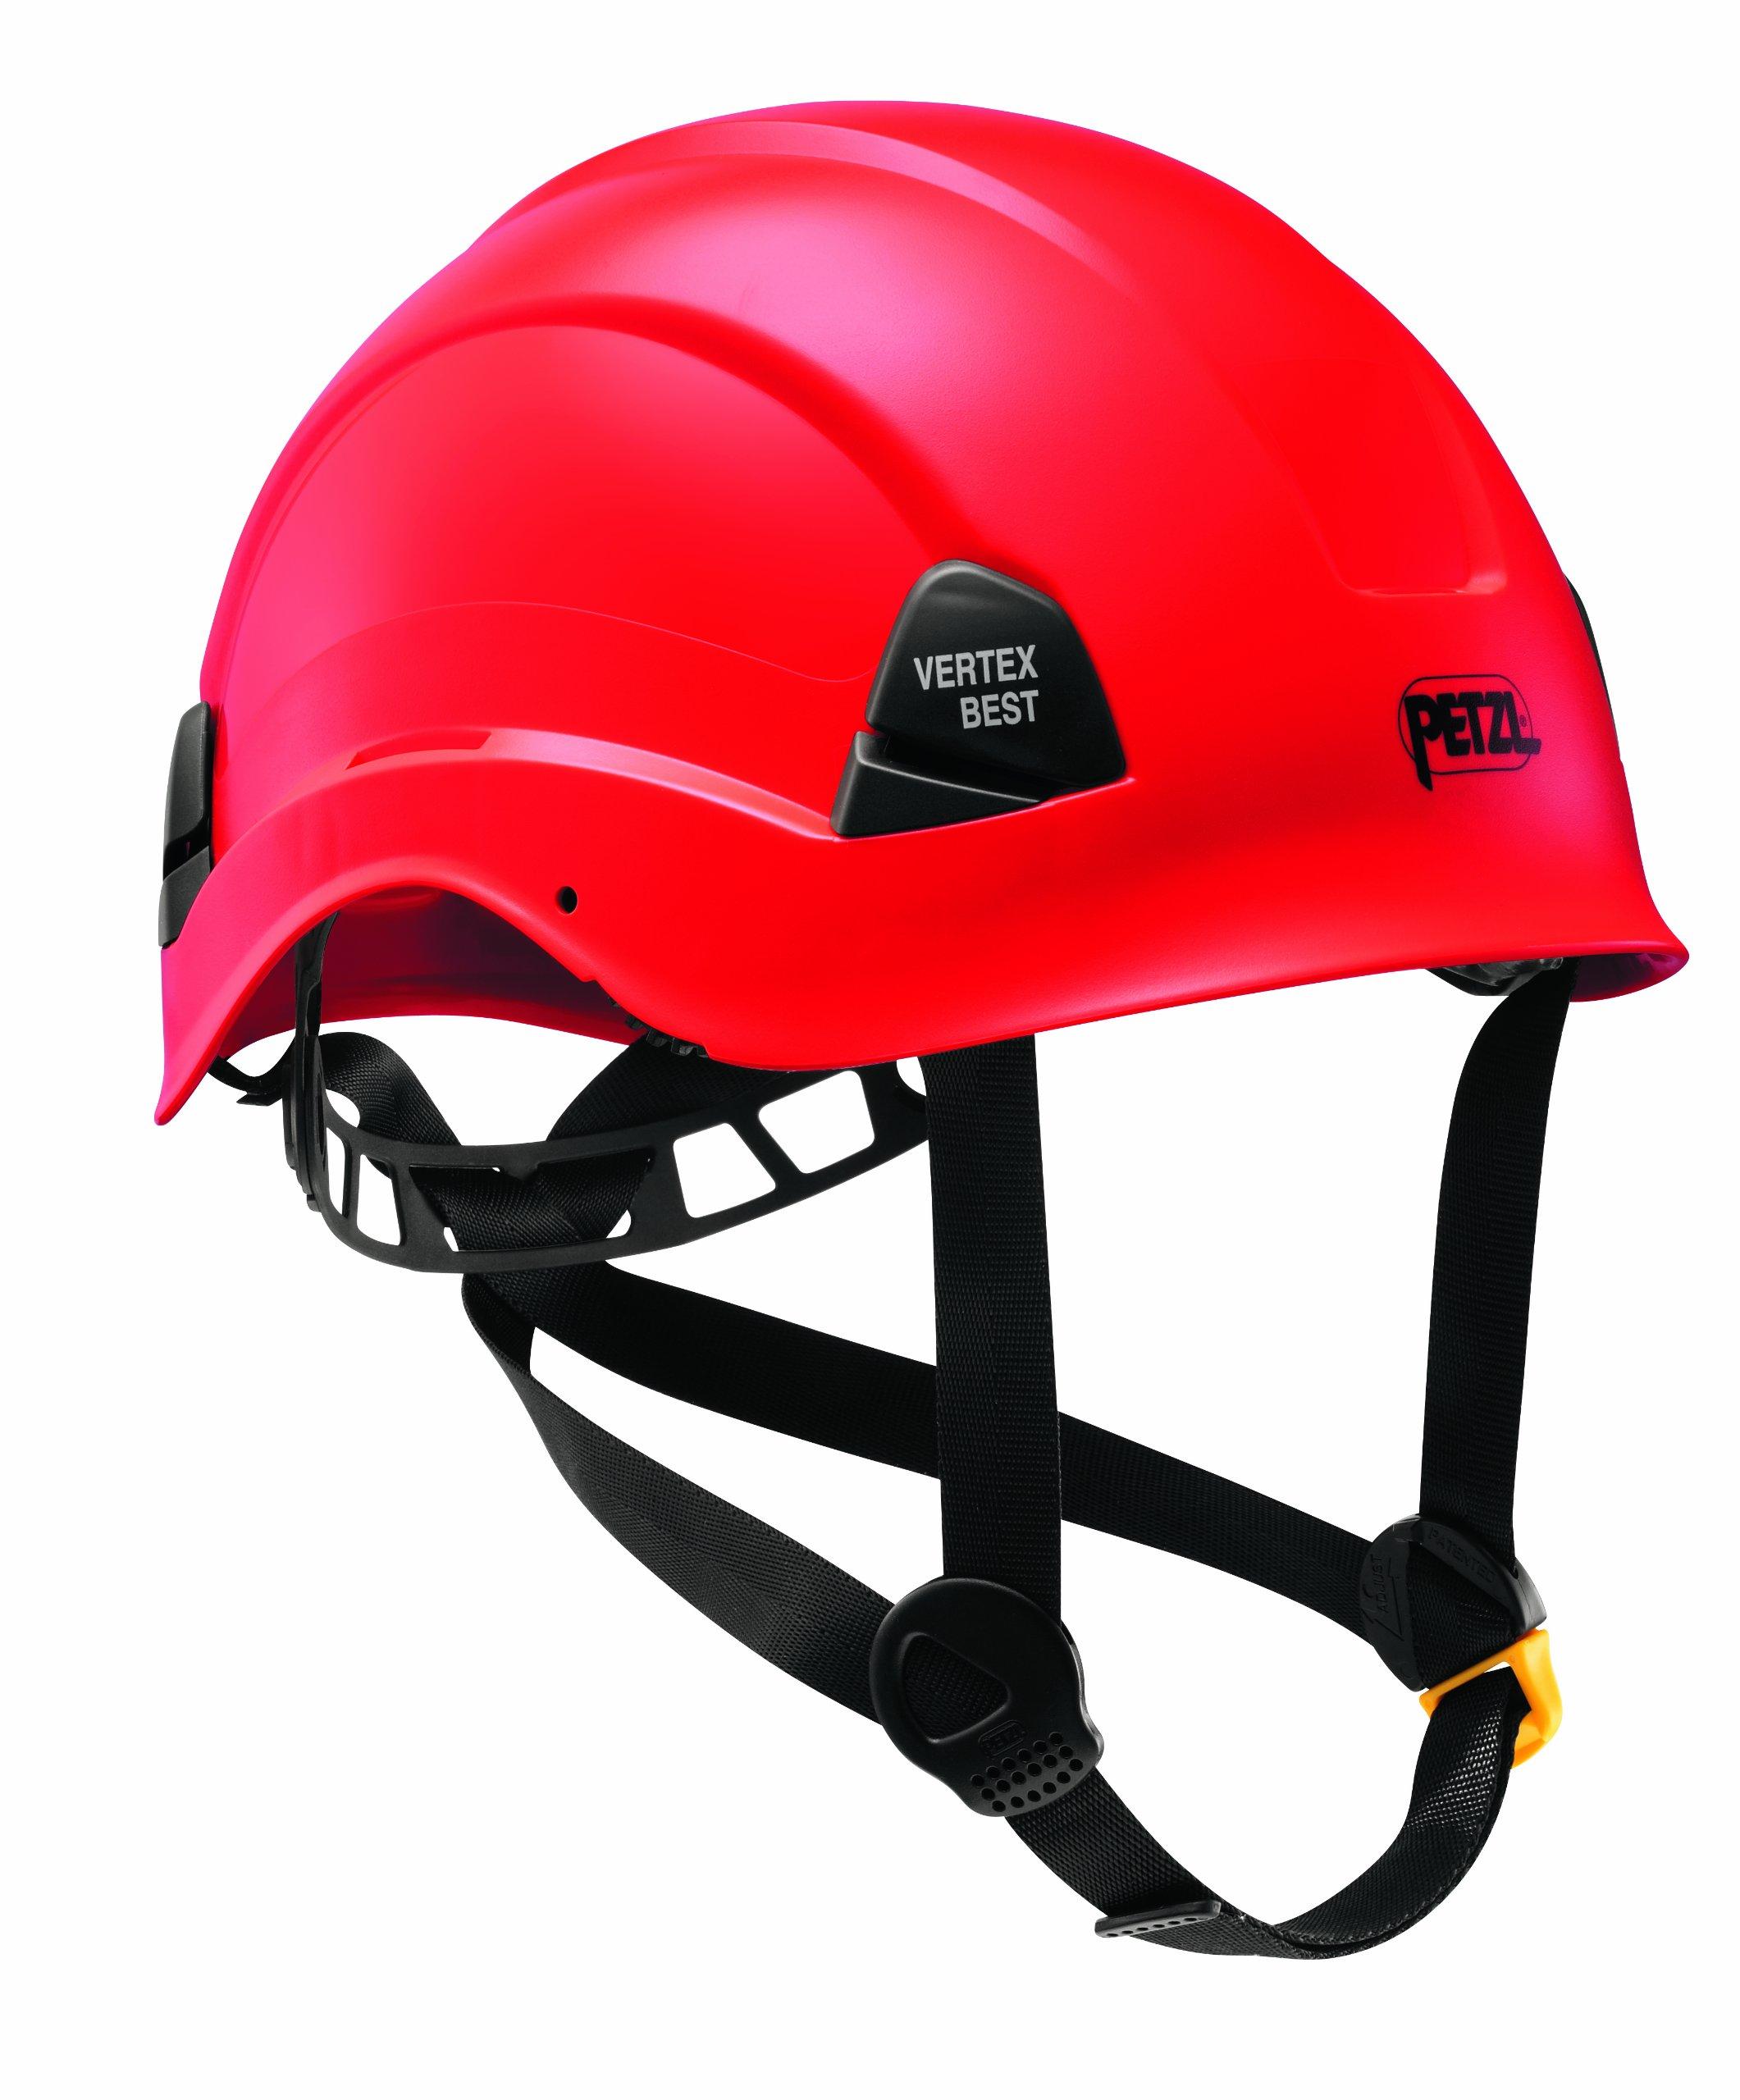 Petzl Pro Vertex Best Professional Helmet - Red